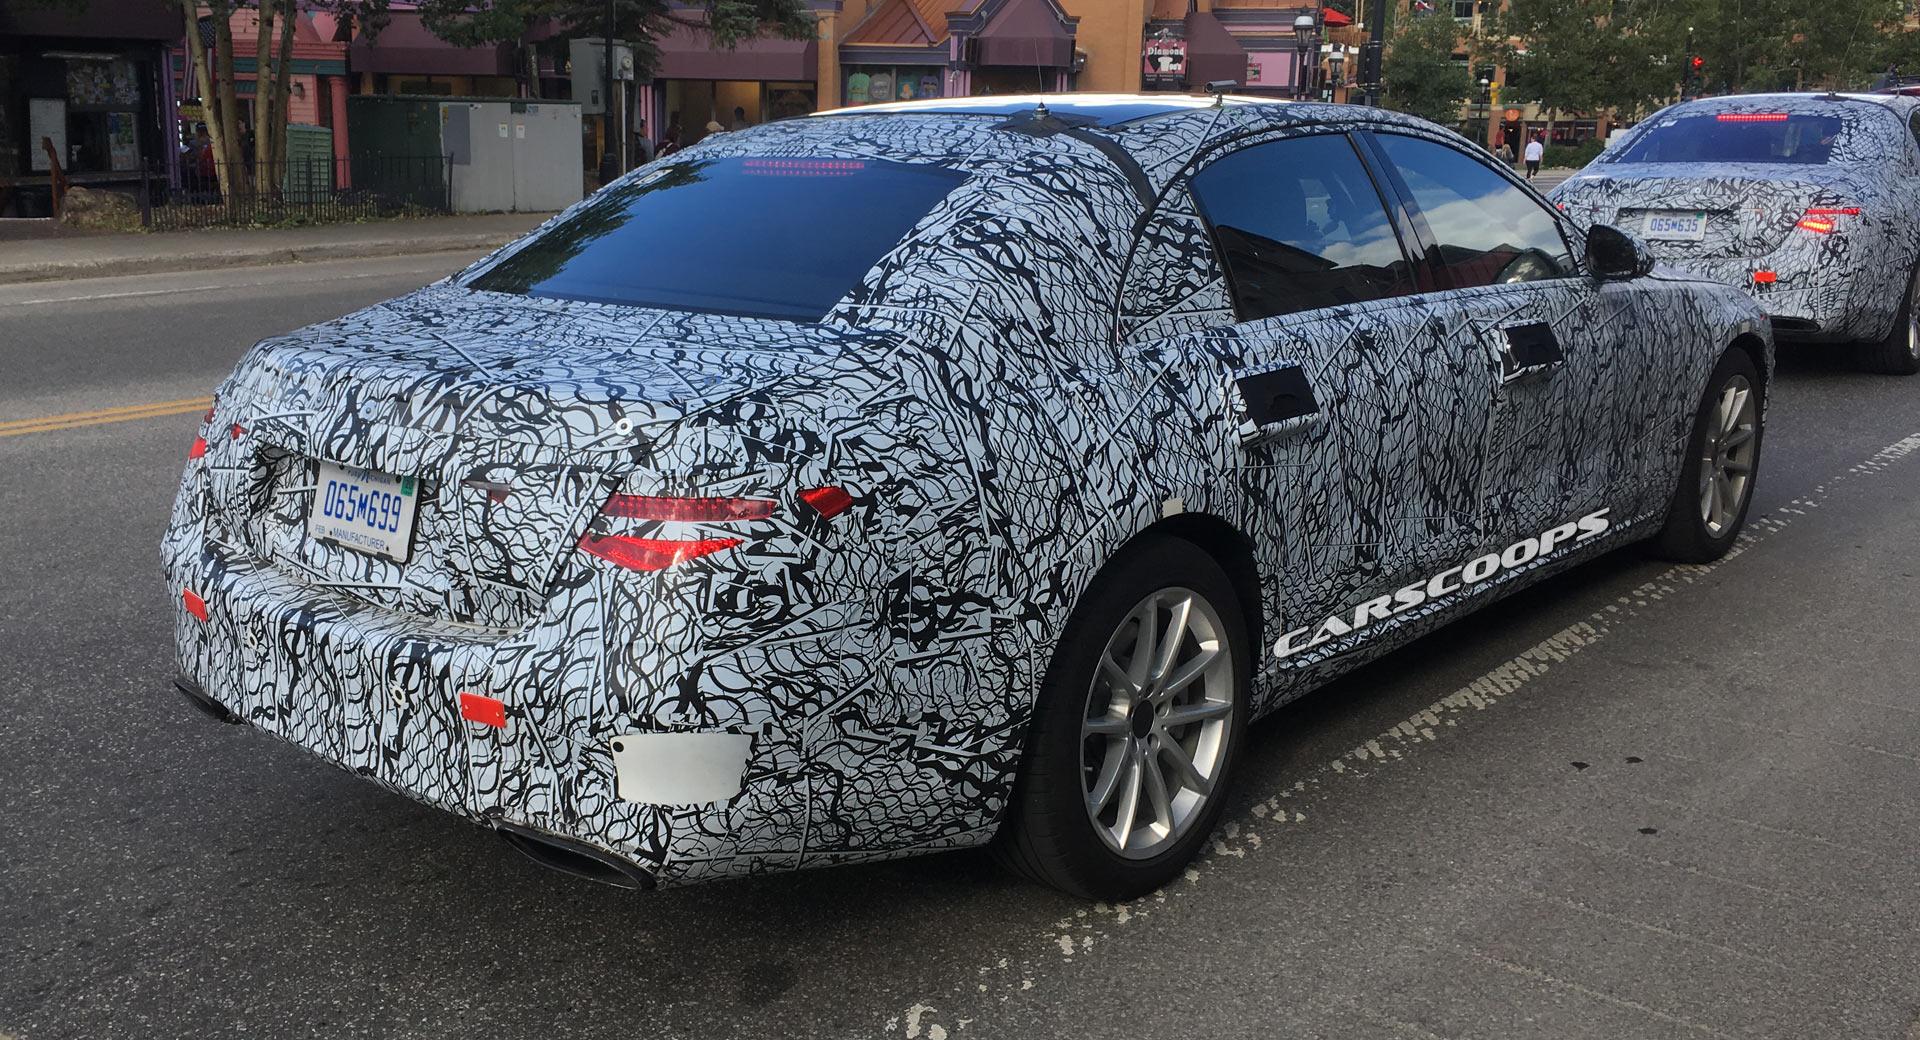 U Spy The New 2020 Mercedes-Benz S-Class With Triangular ...